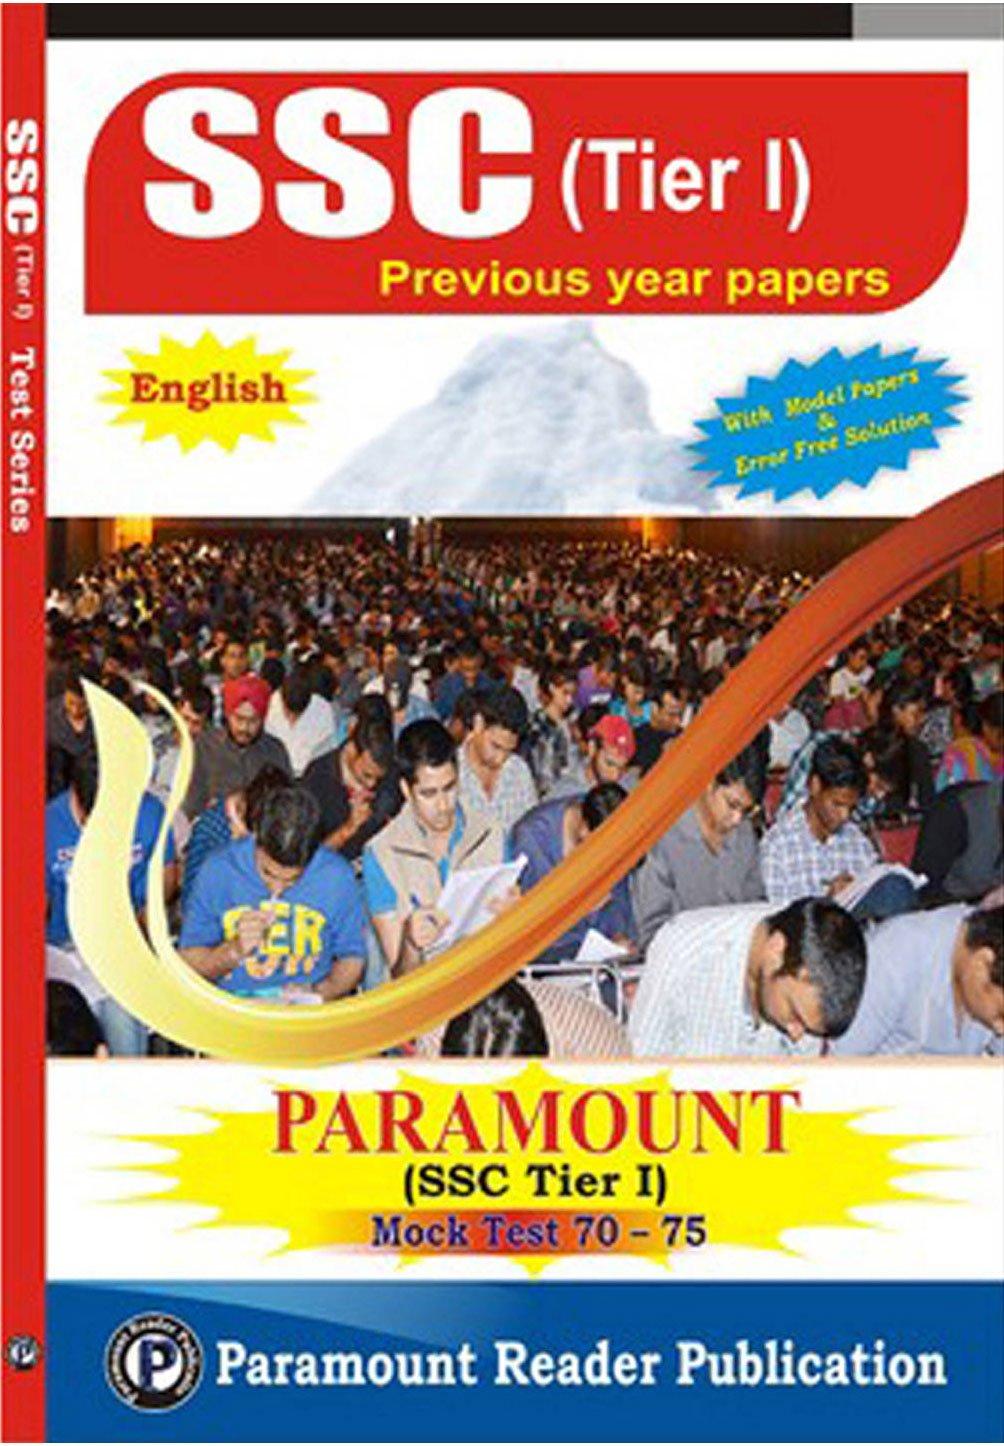 Paramount English Book By Neetu Singh Pdf